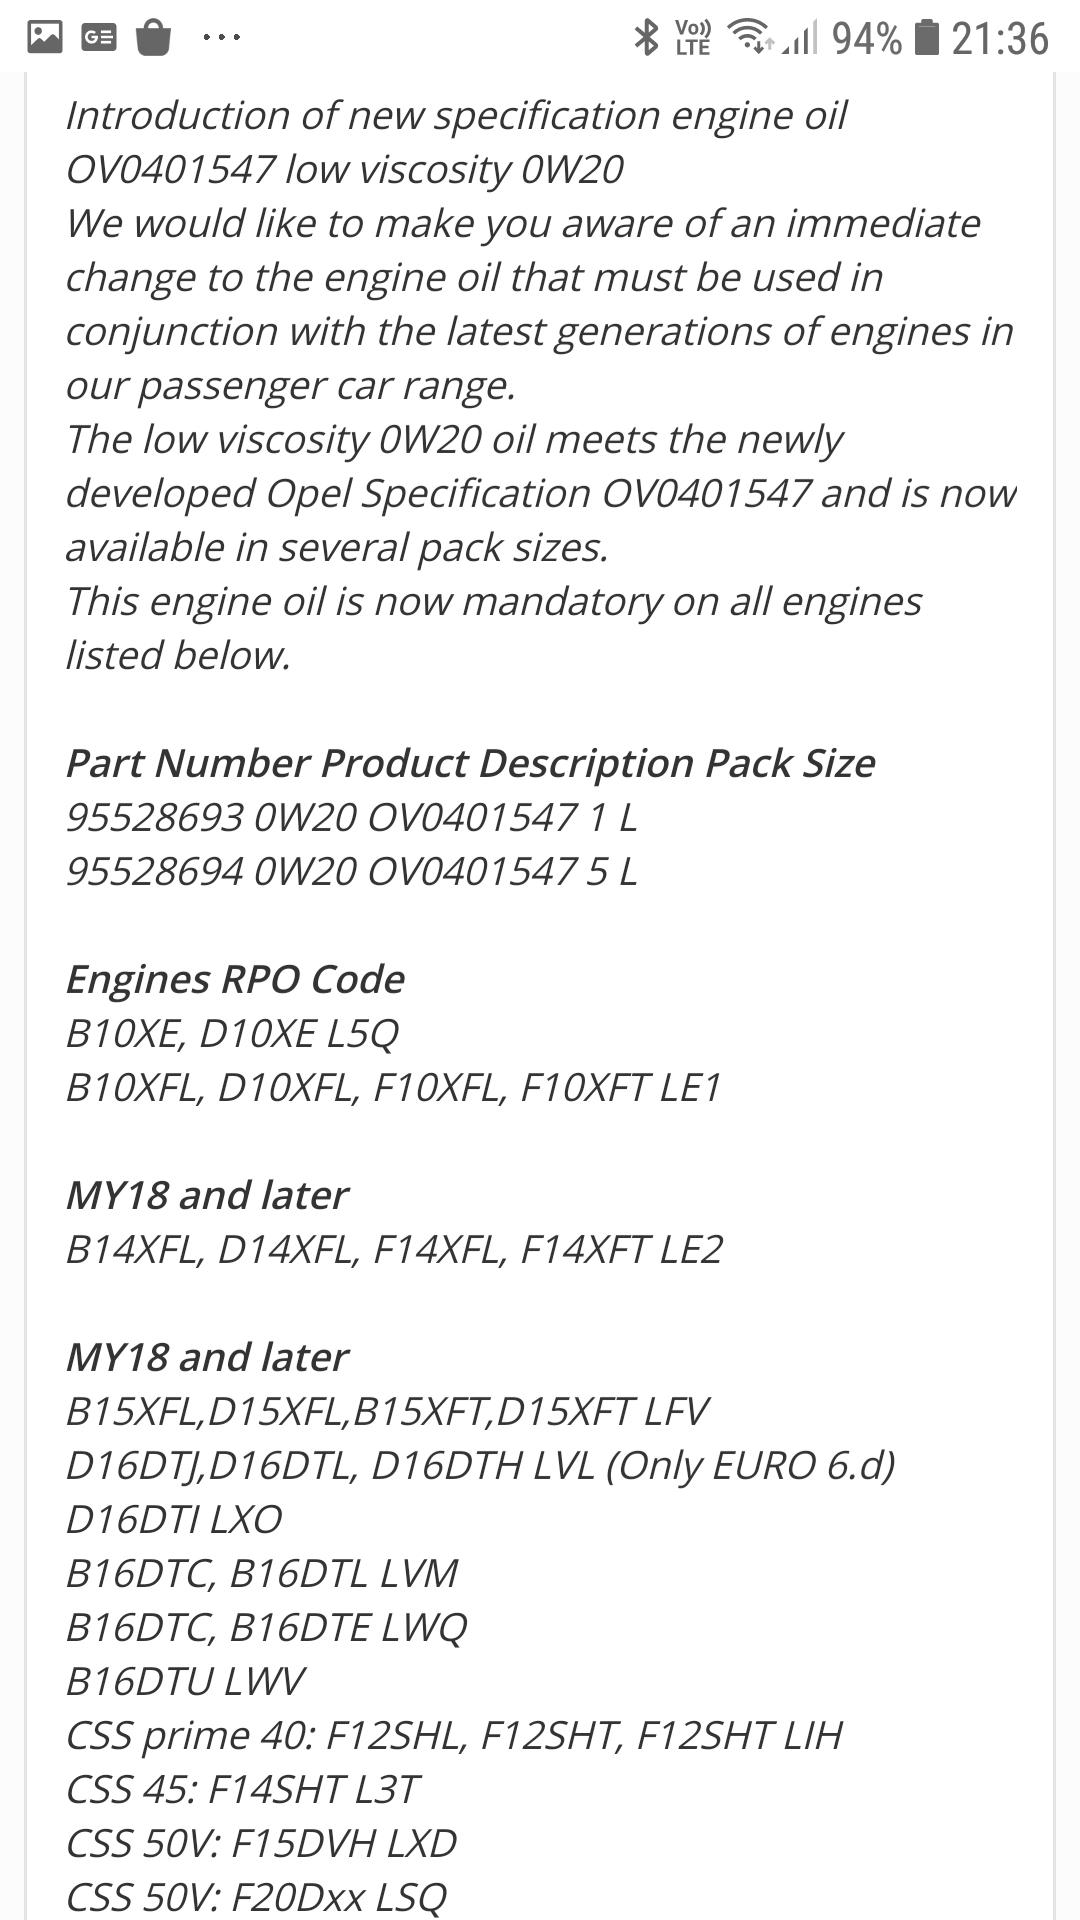 Cambio especificacion aceite Astra 1.4T 125cv File